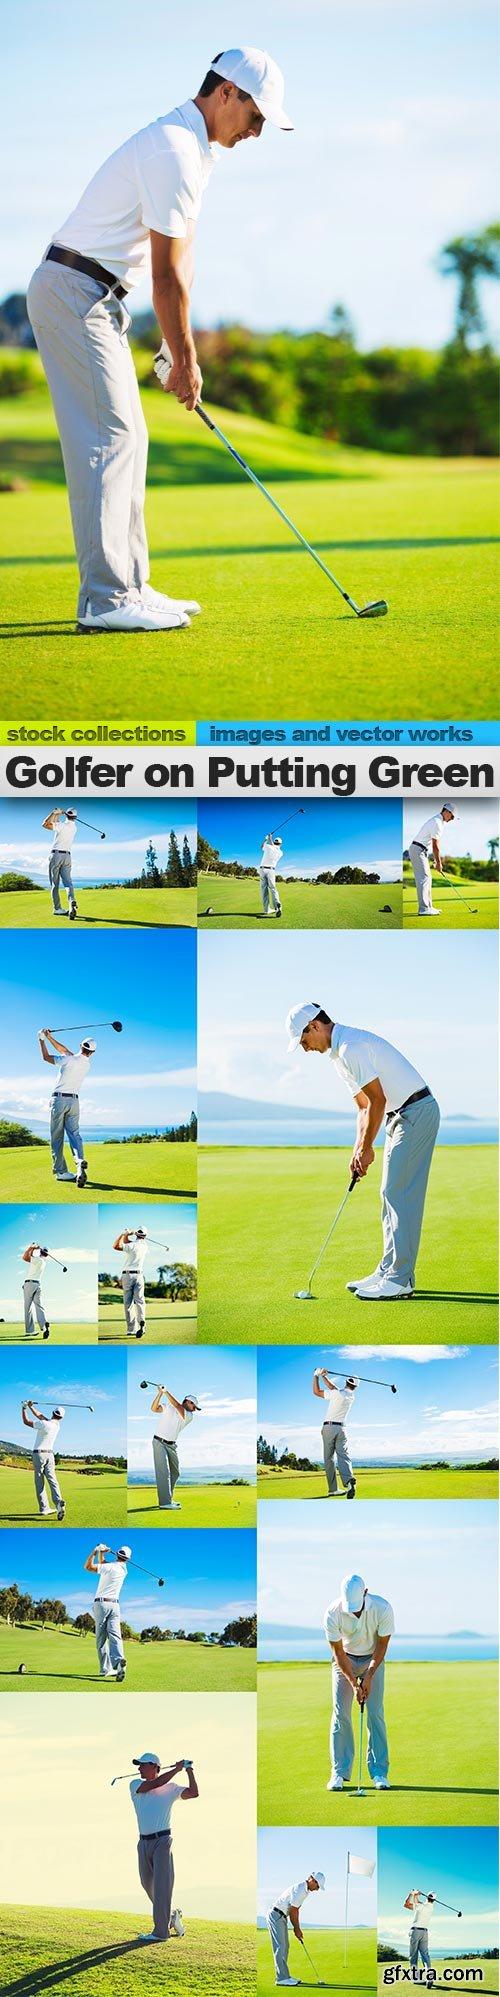 Golfer on Putting Green, 15 x UHQ JPEG